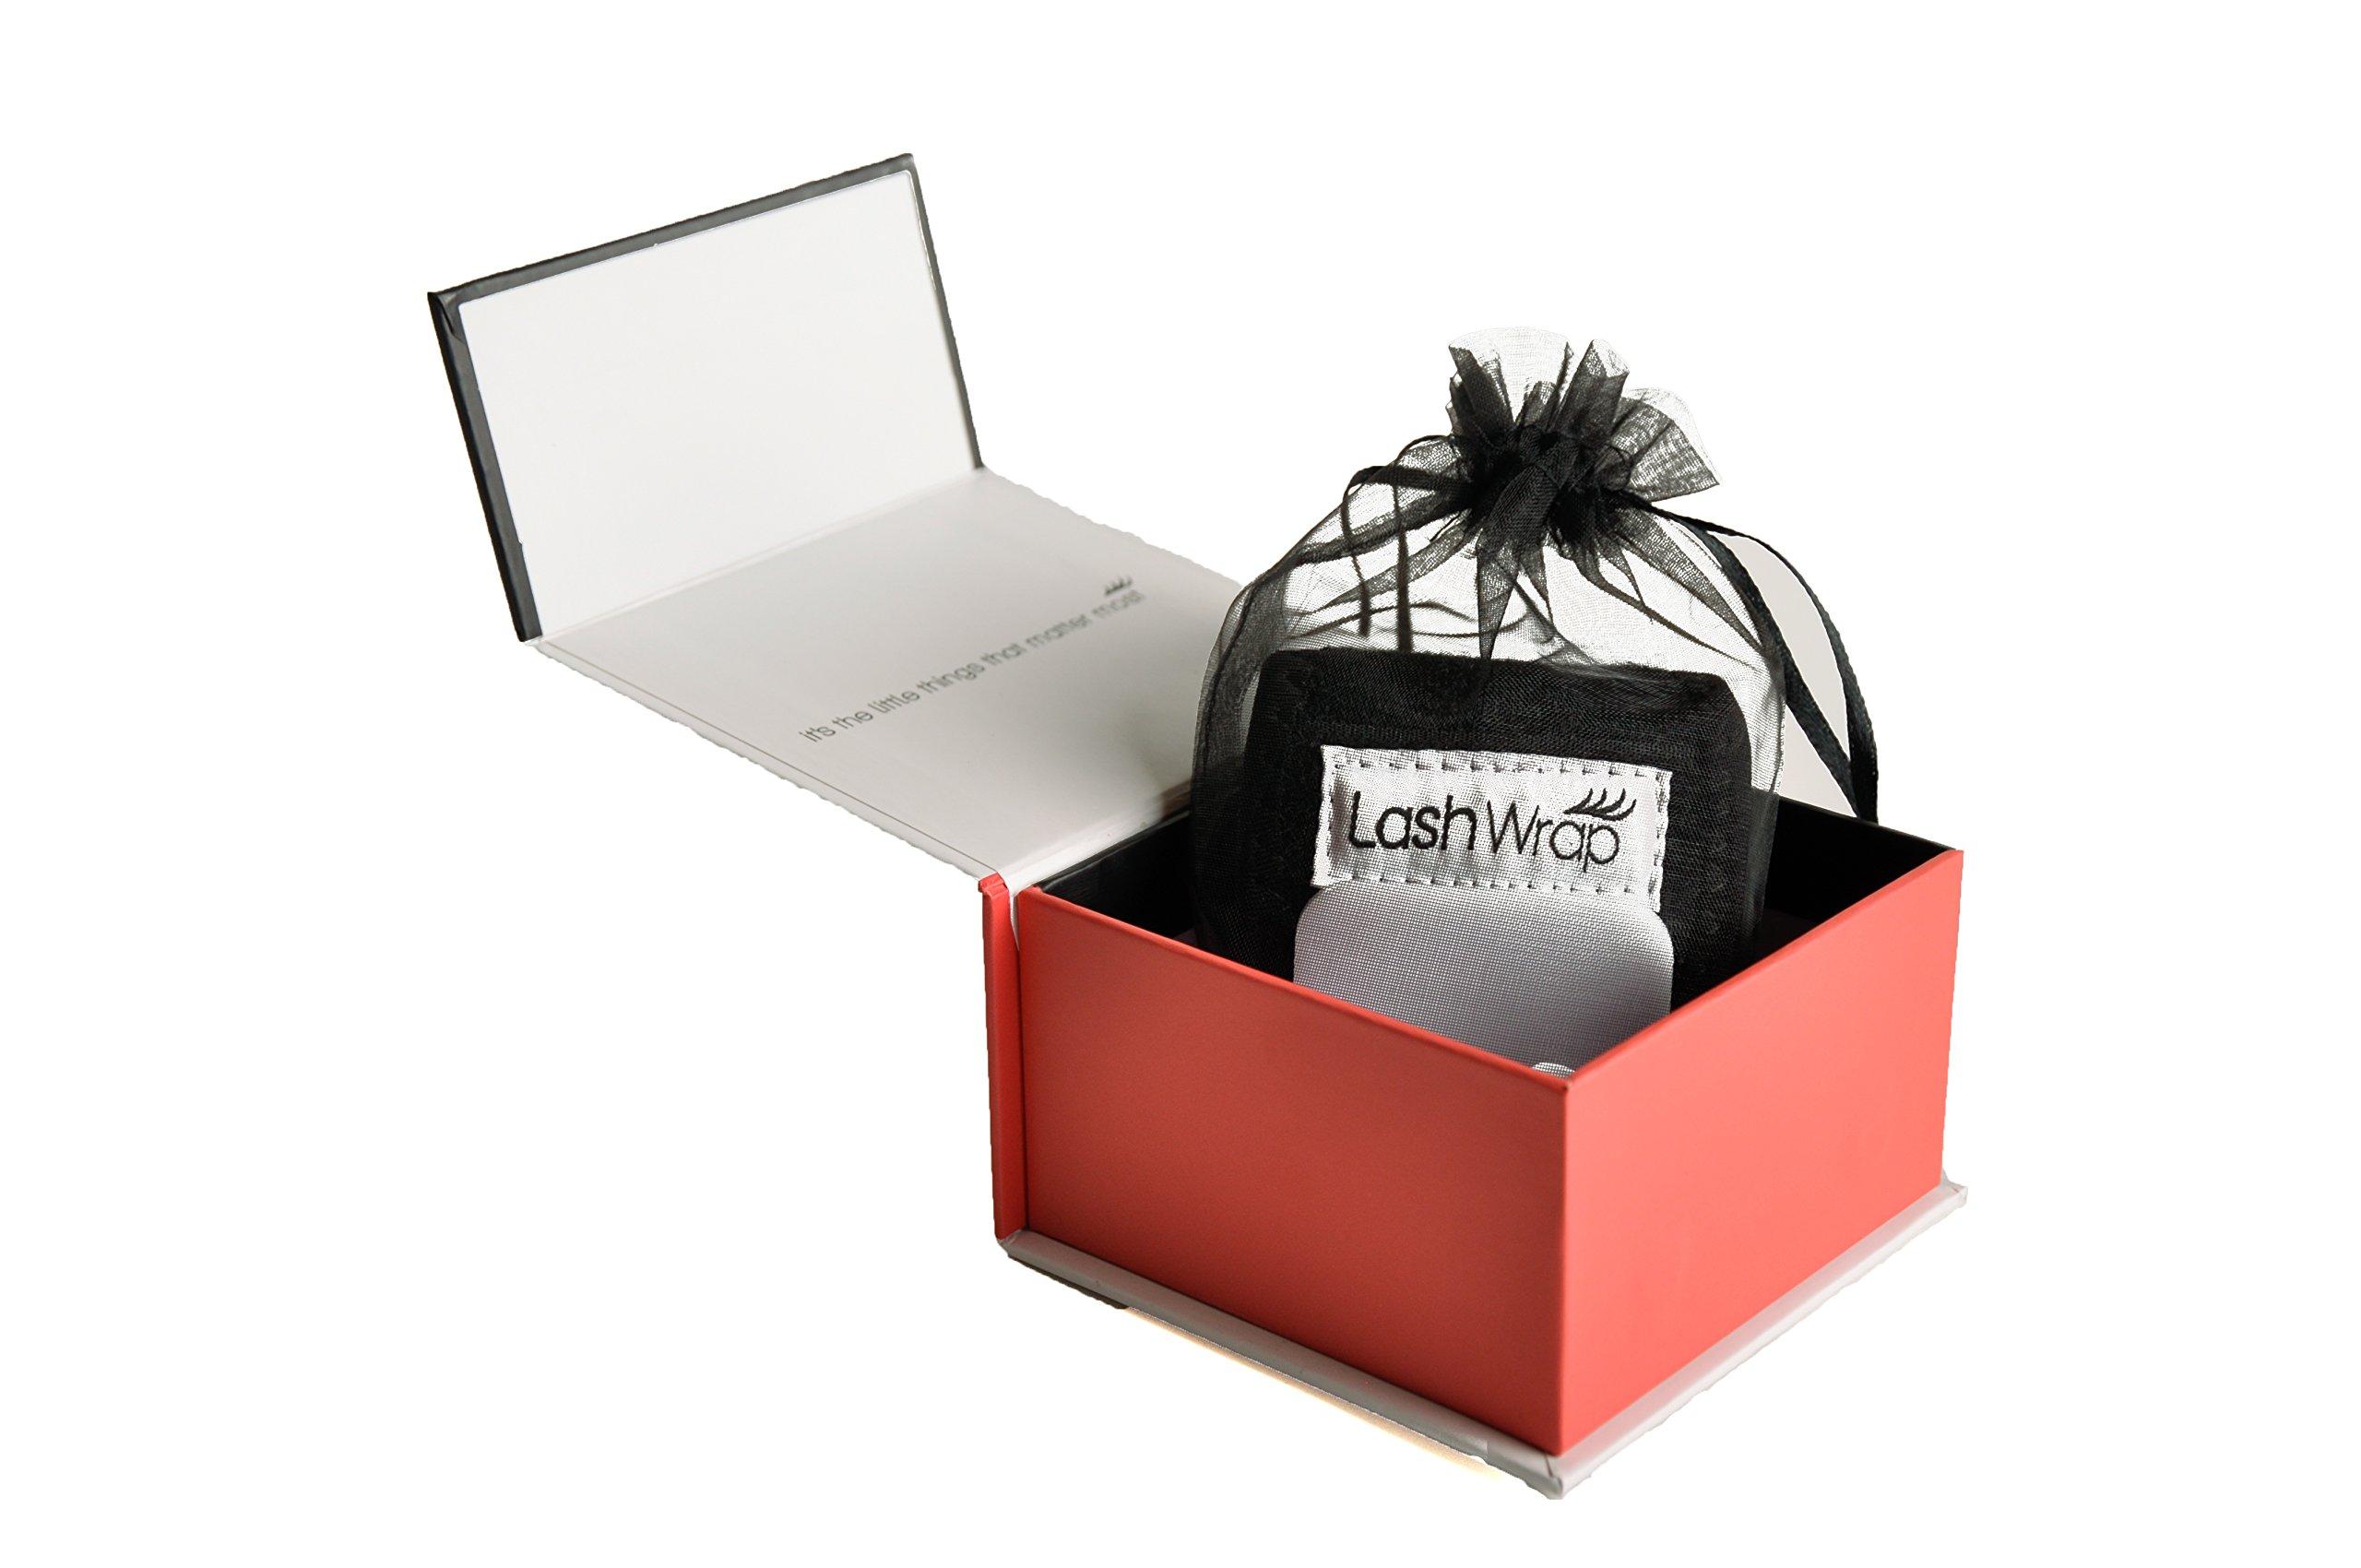 LashWrap Eyelash Extension Application Tool - Wrist Wrap with Lash Palatte - One Size ... (Black)